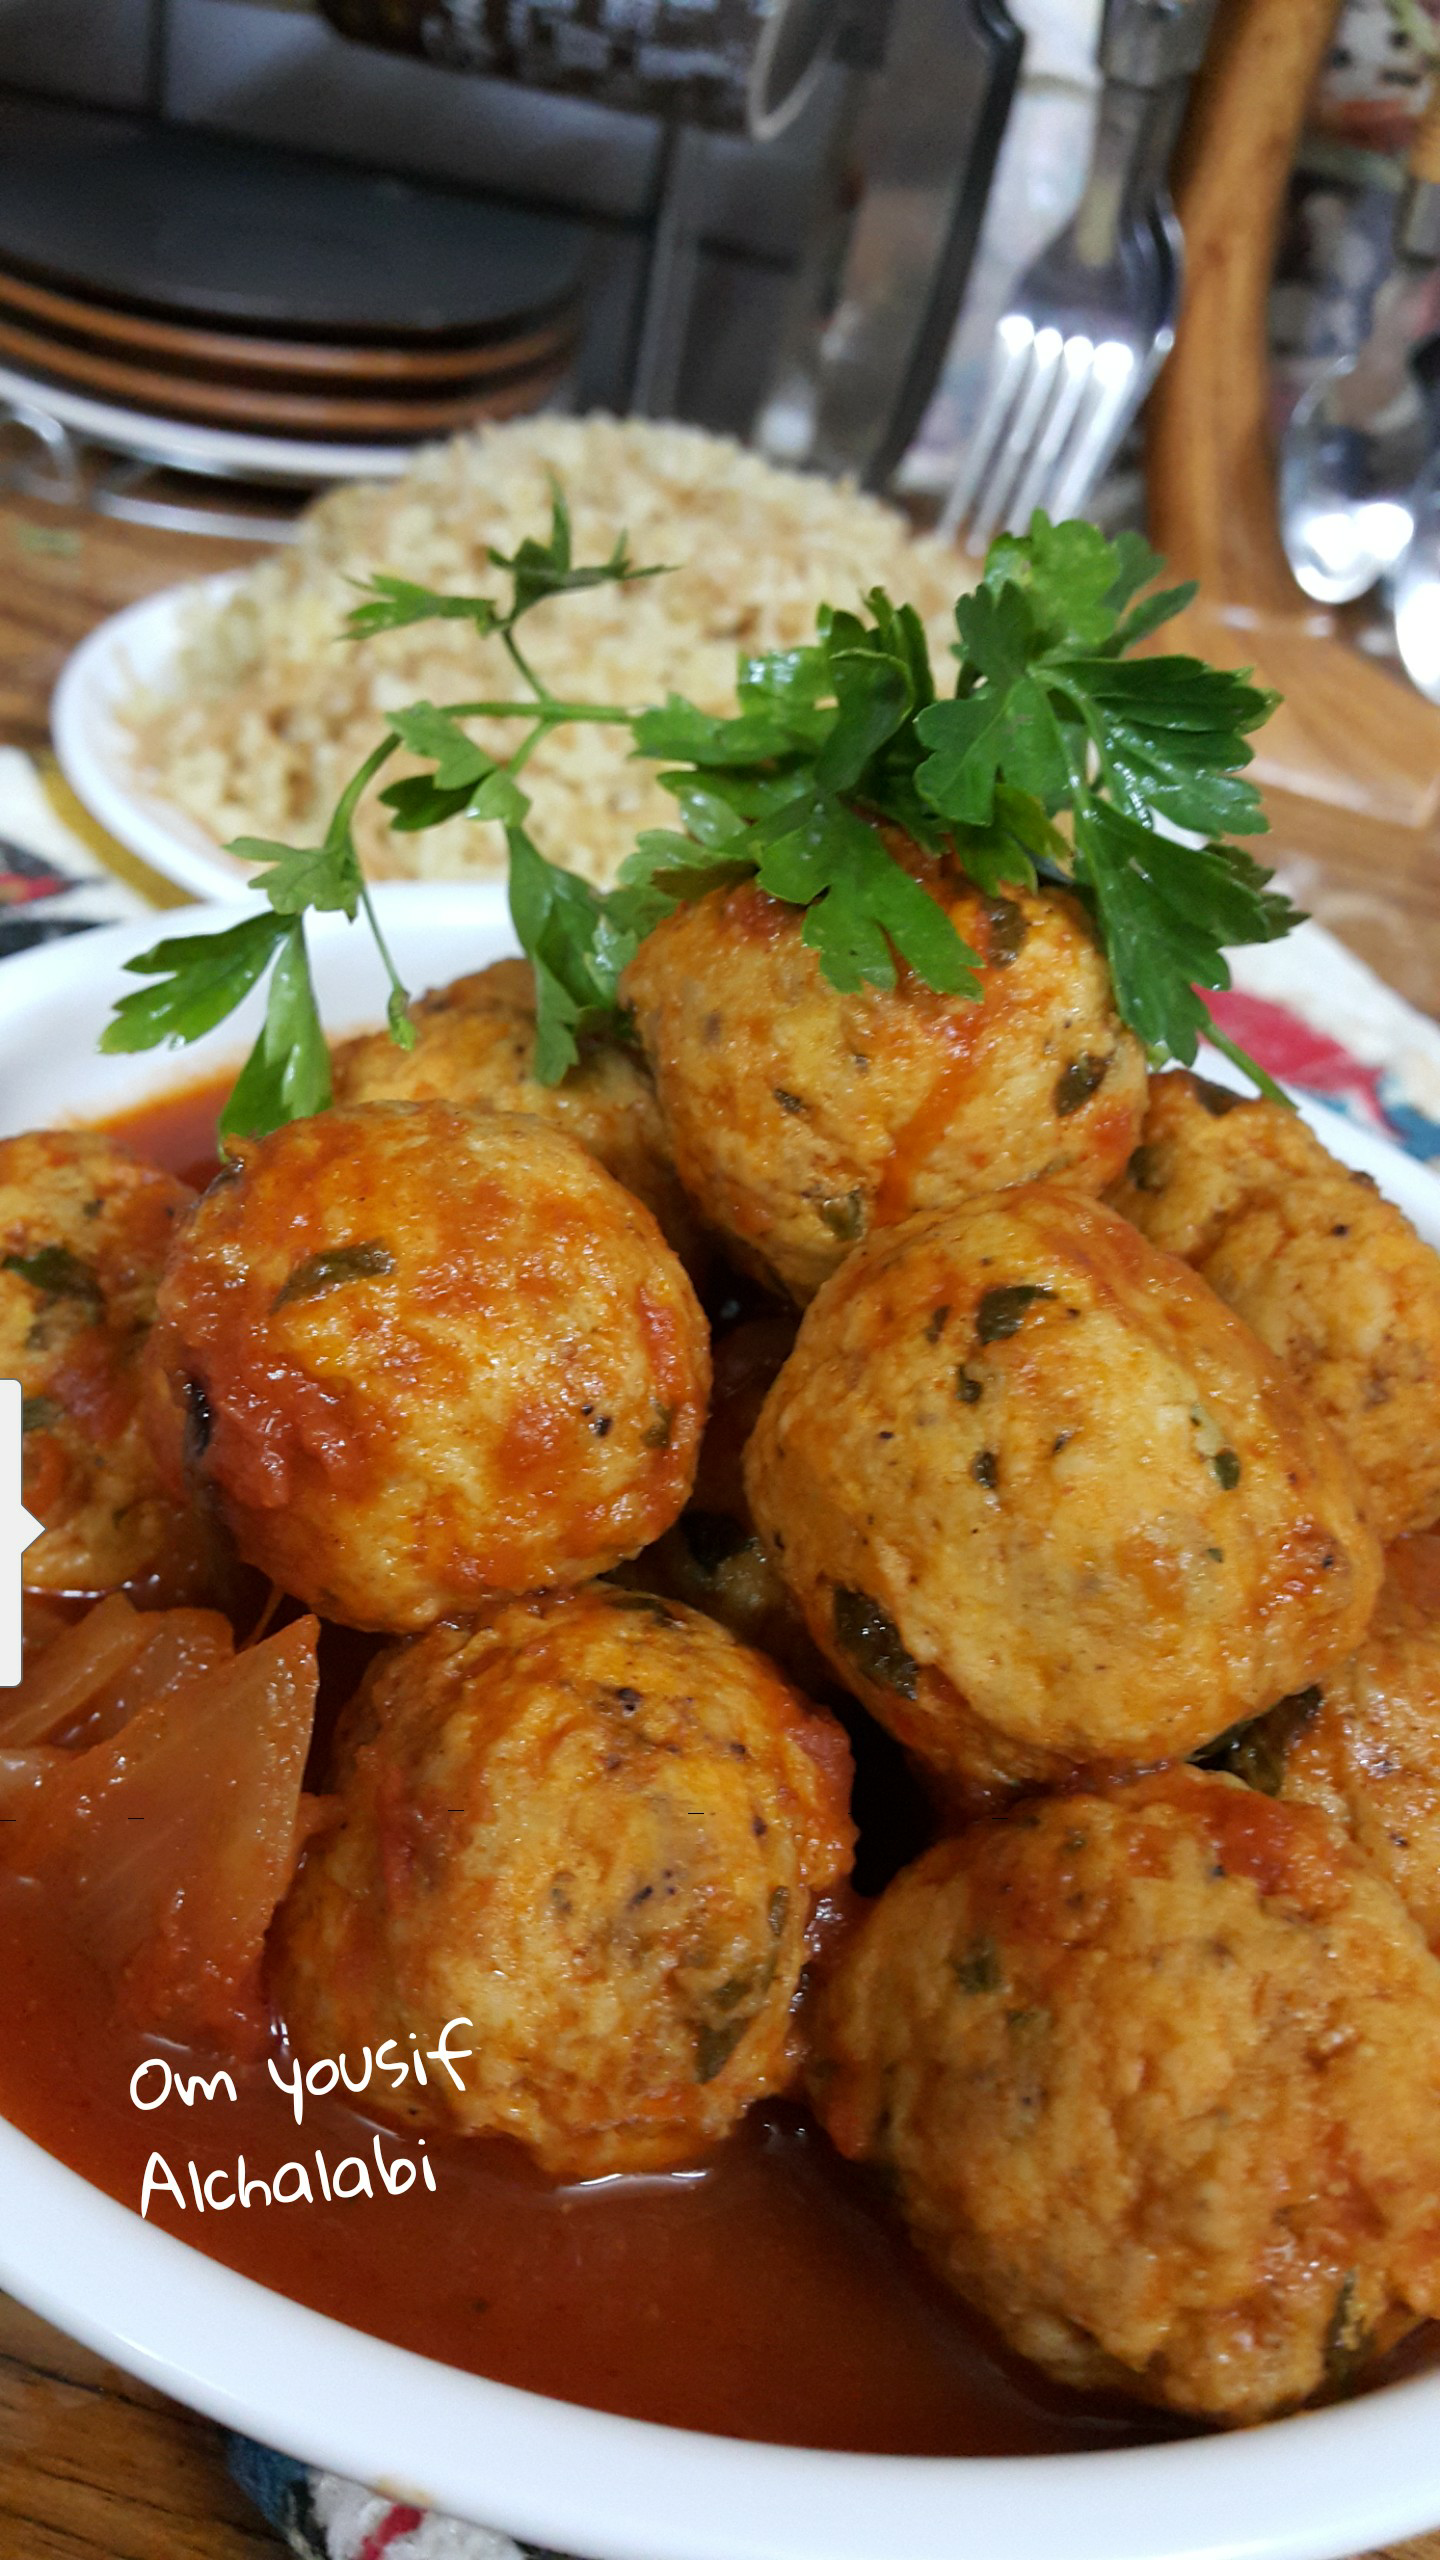 داود باشااا بلحم الدجاج المفروم زاكي European Food Food Dishes Main Dishes